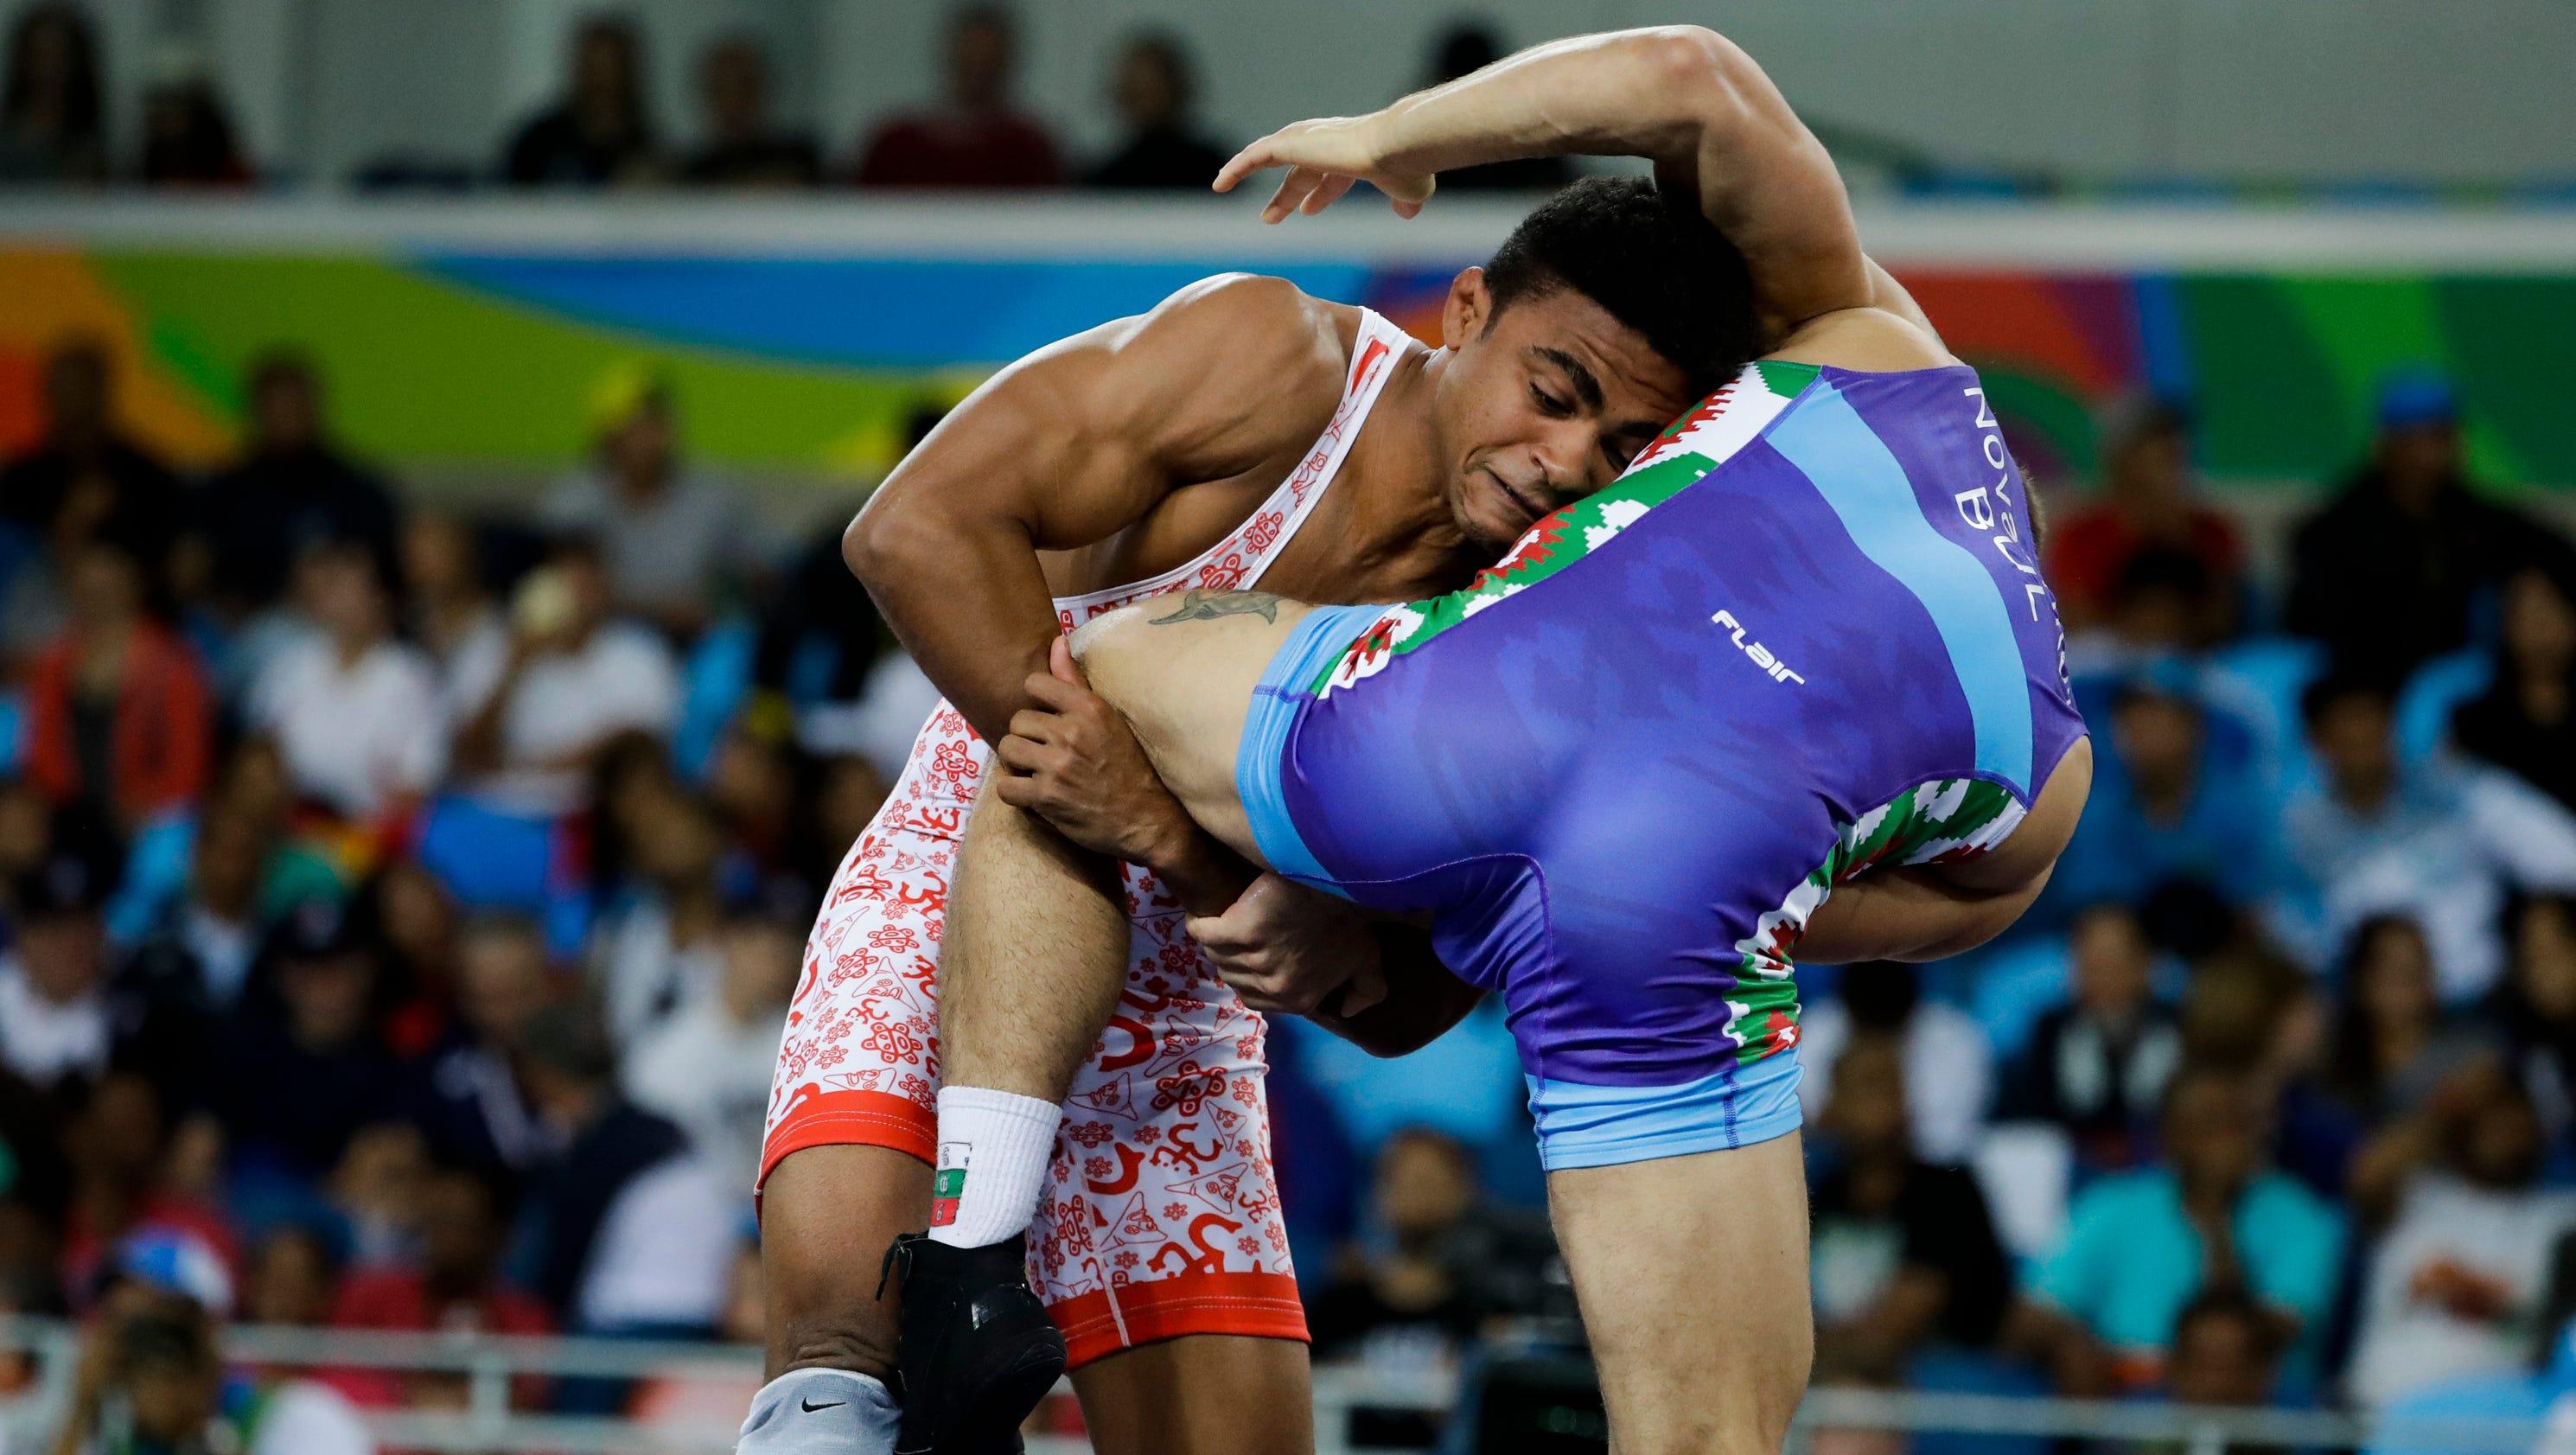 636073844905343574-ap-rio-olympics-wrestling-me-1-